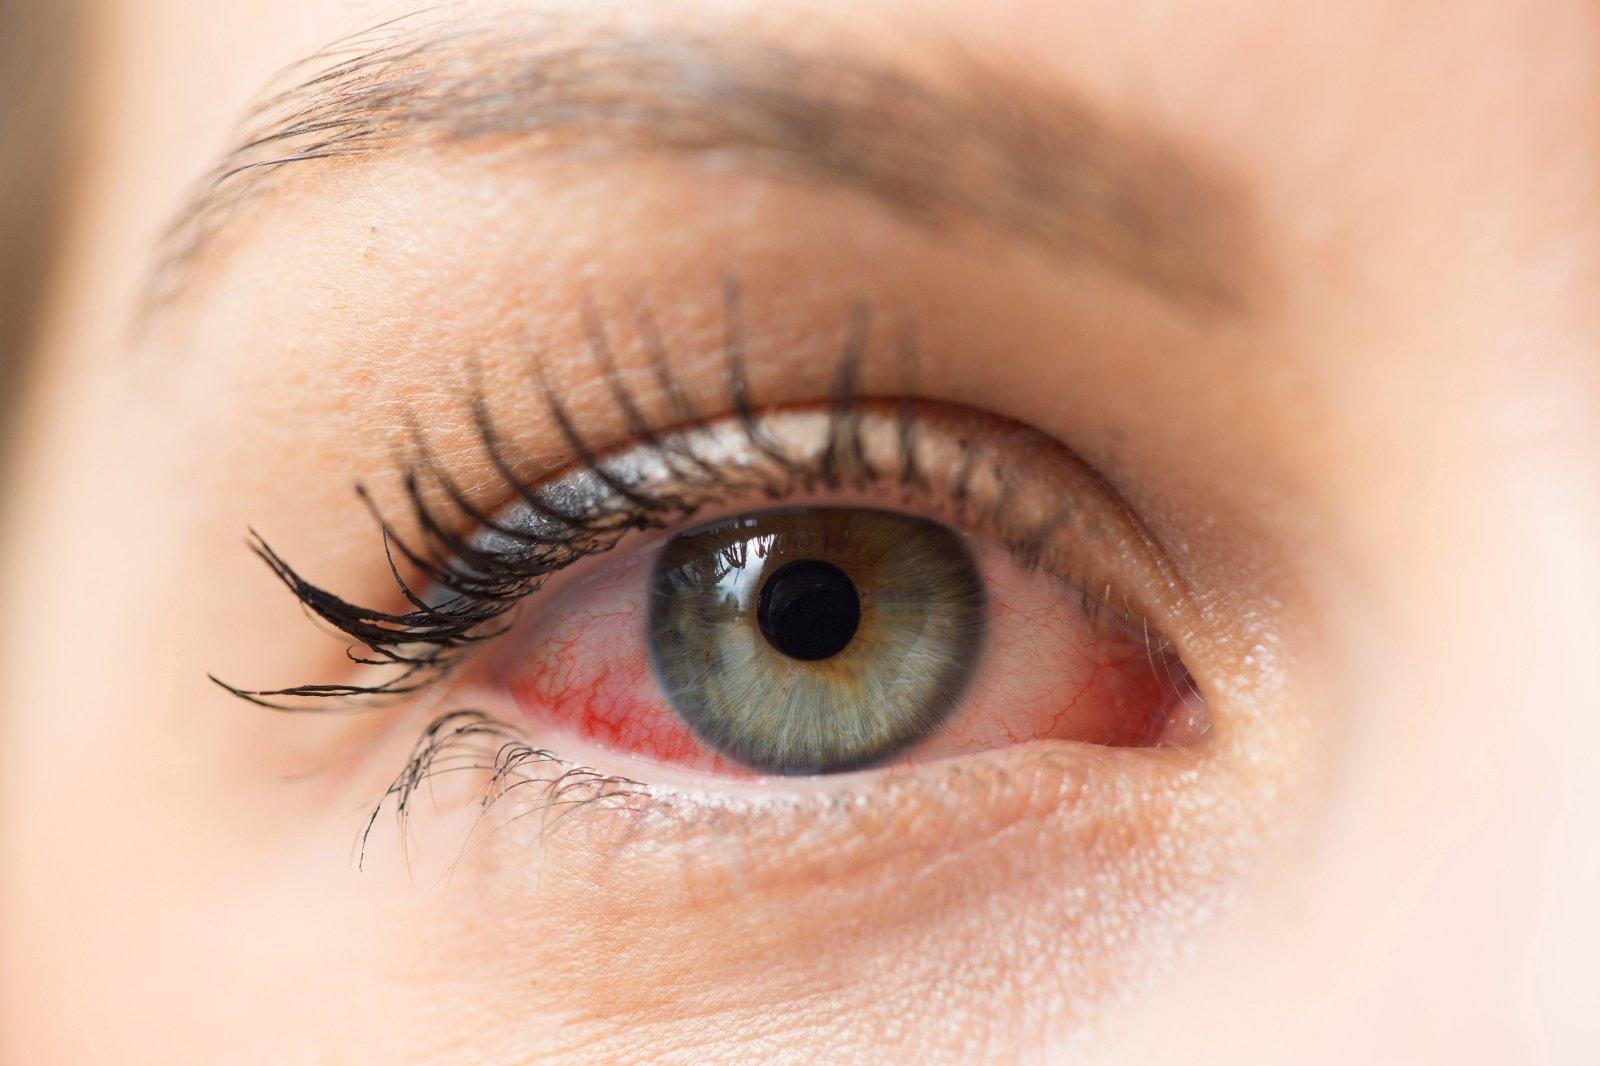 sergant hipertenzija, gali skaudėti akis)